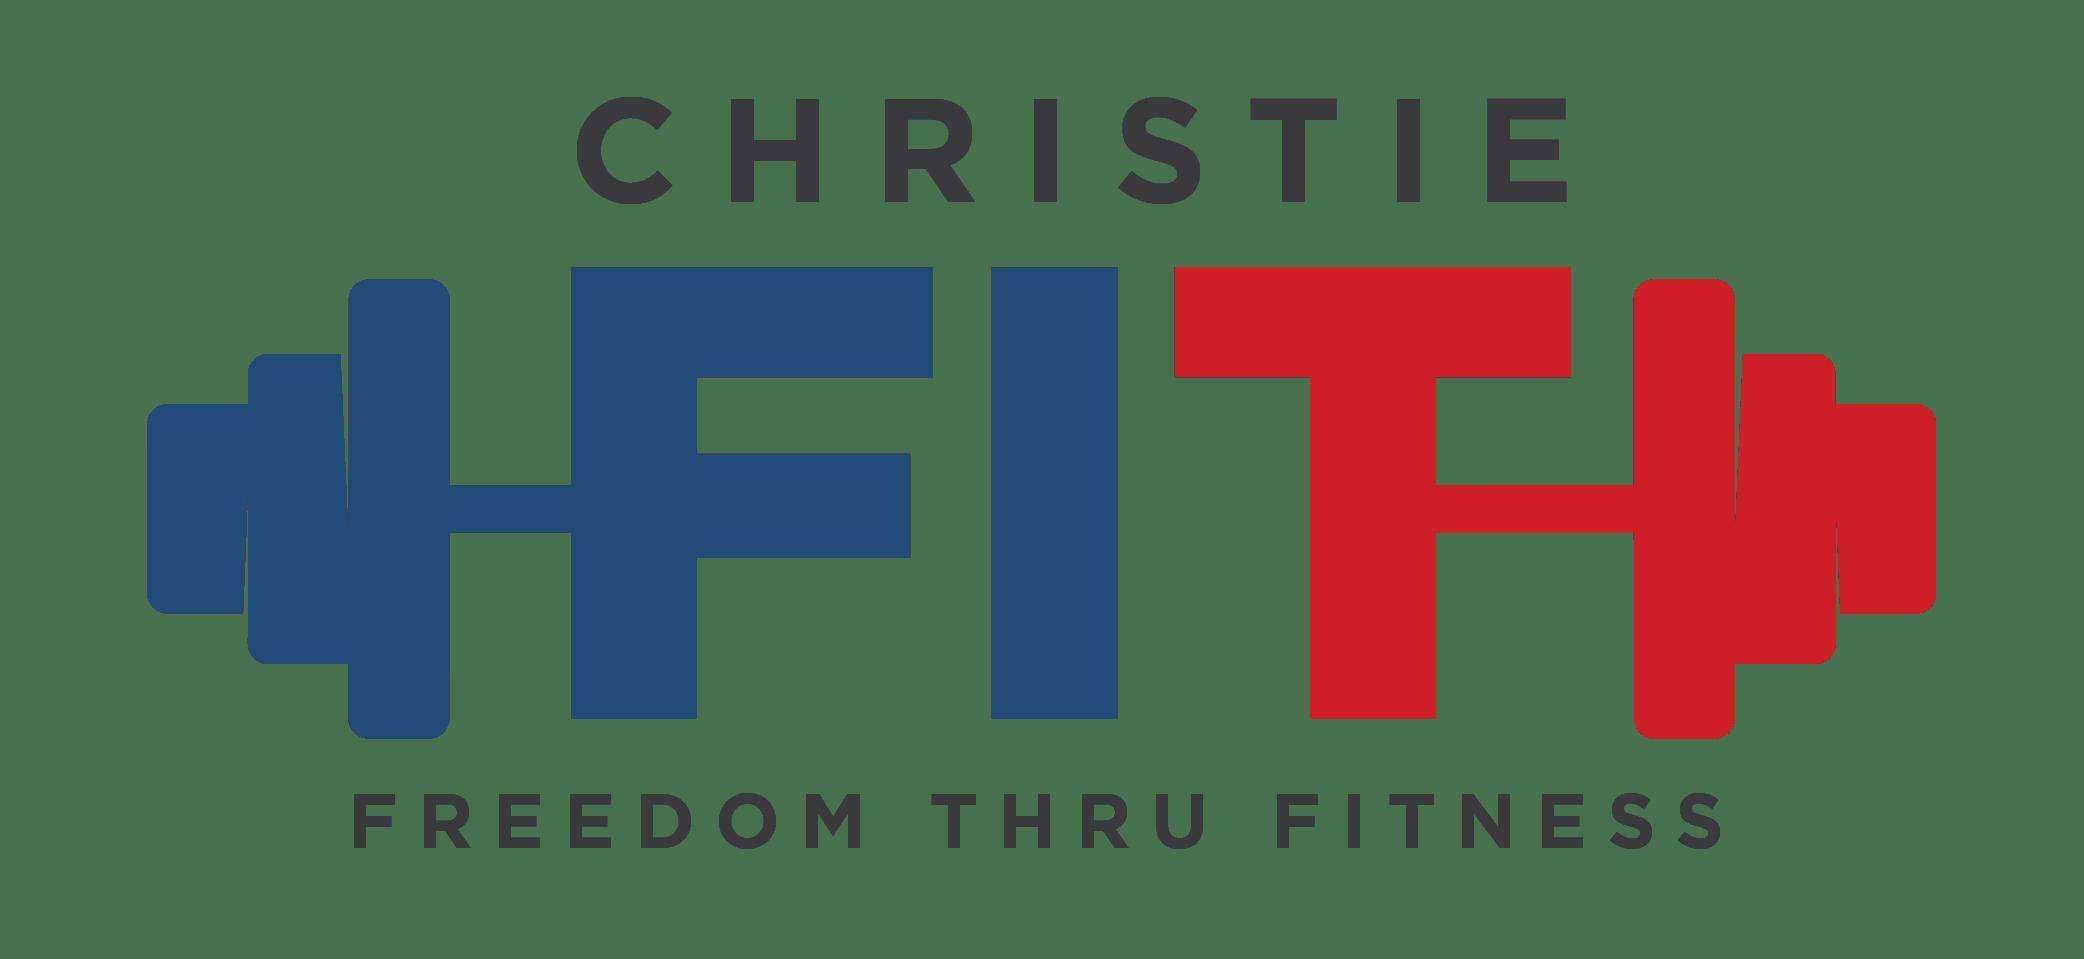 Christie Fit